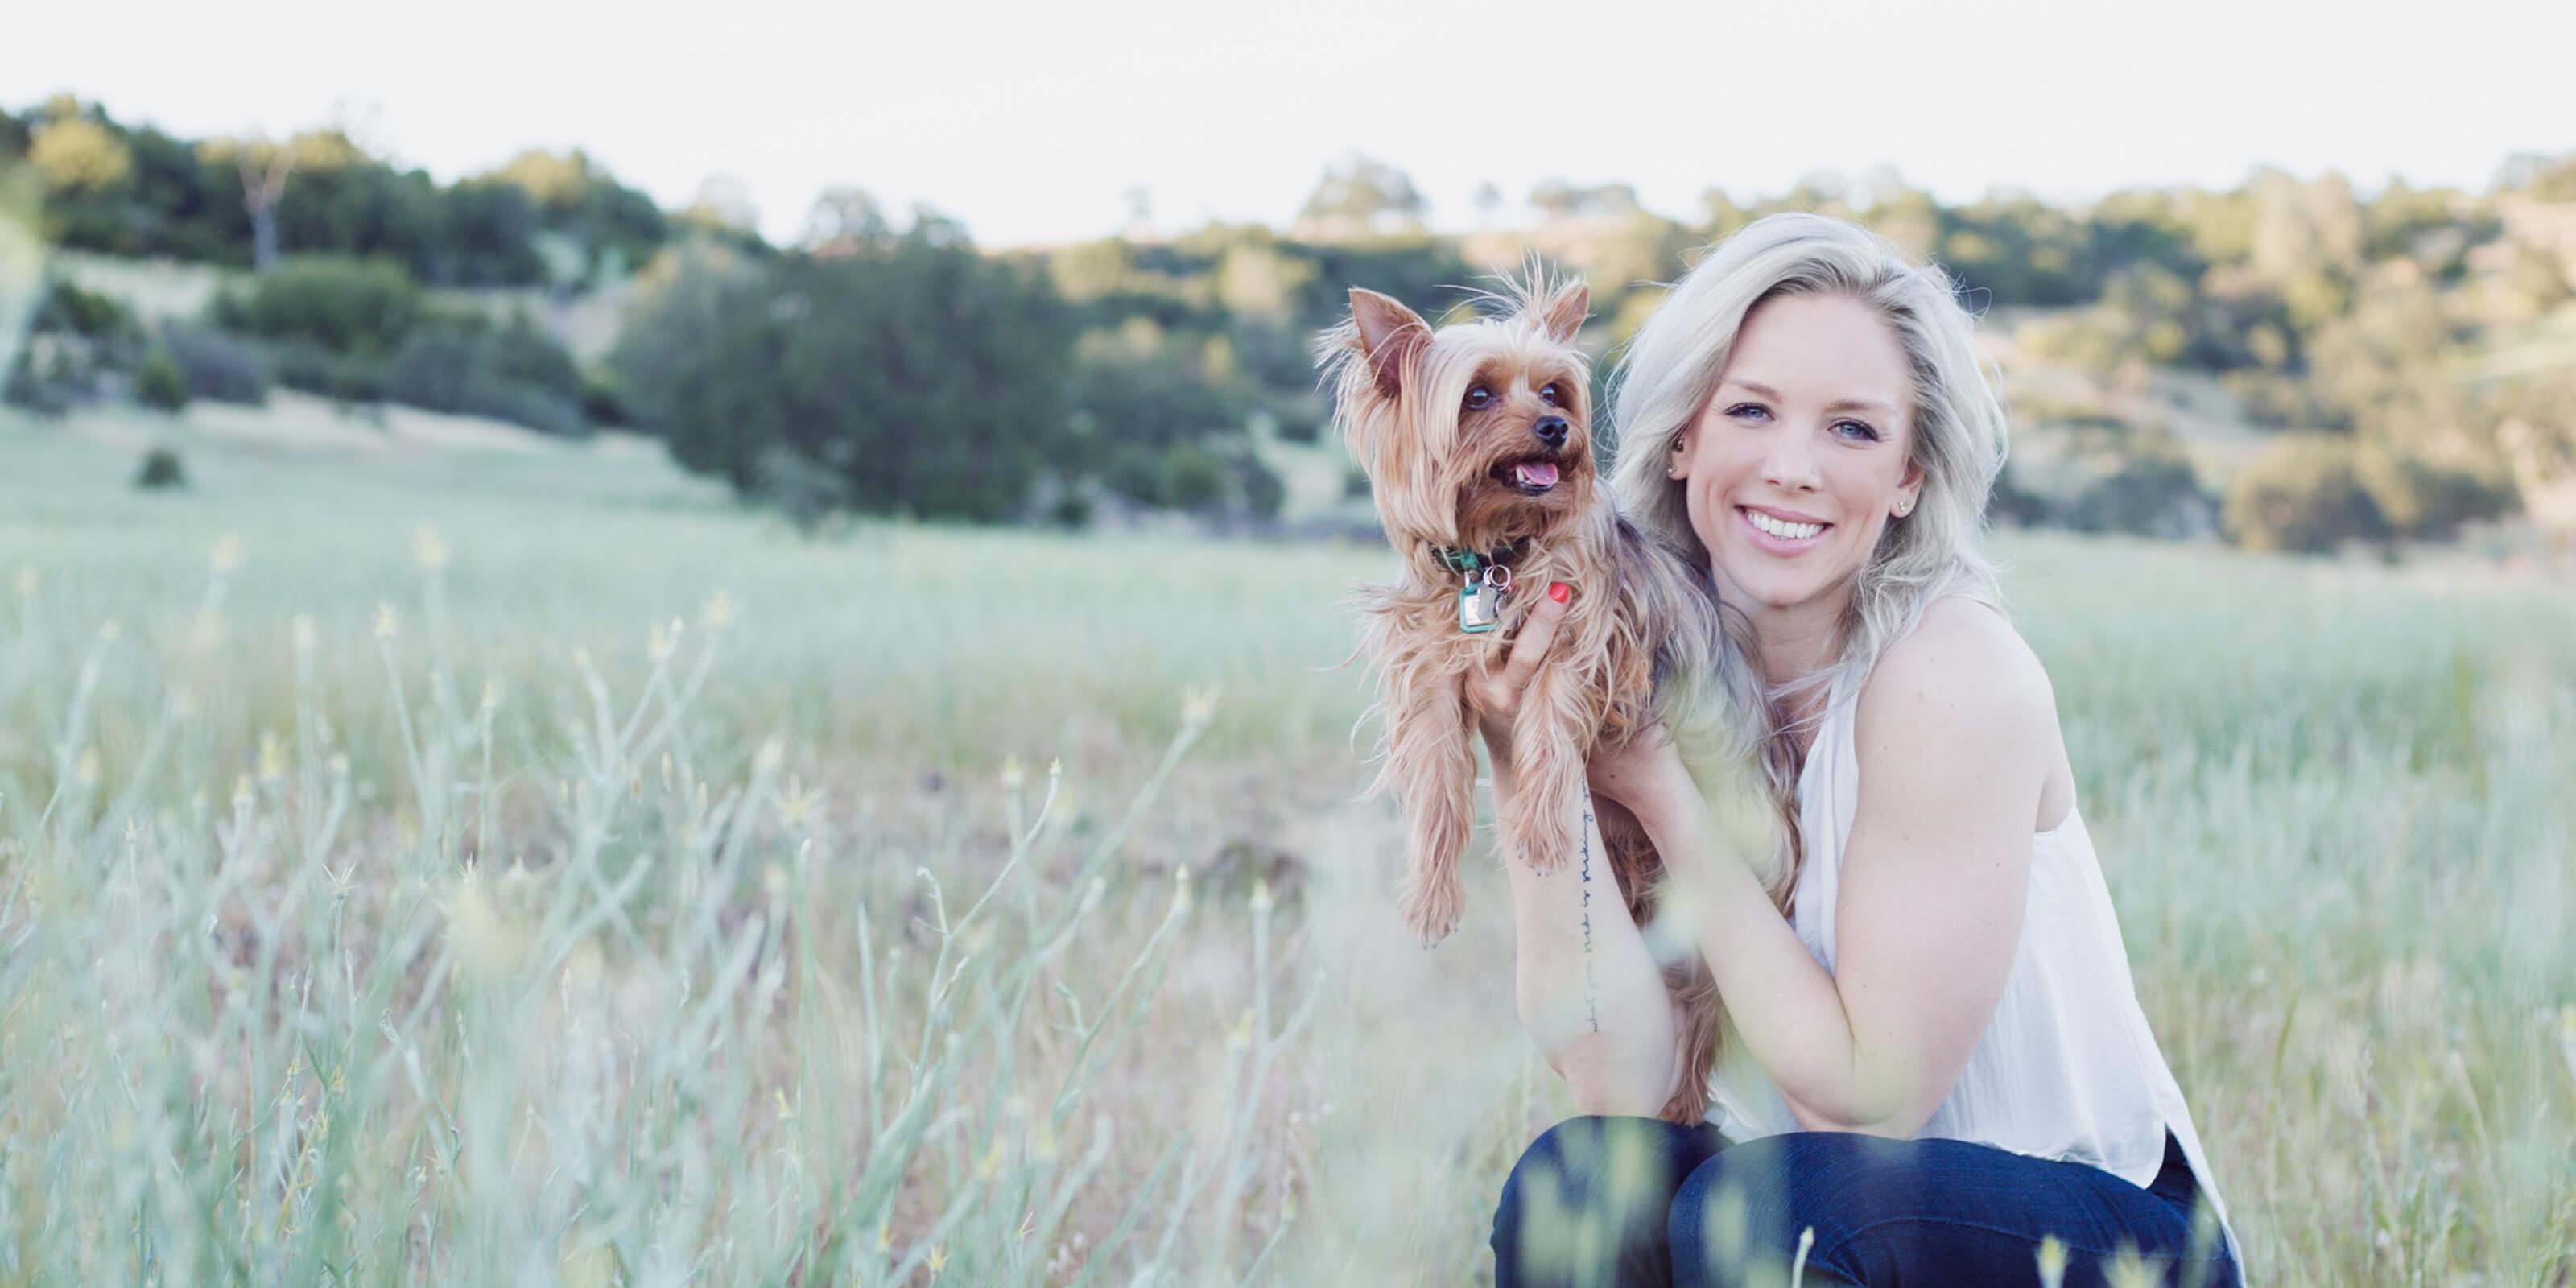 alex waite holding dog